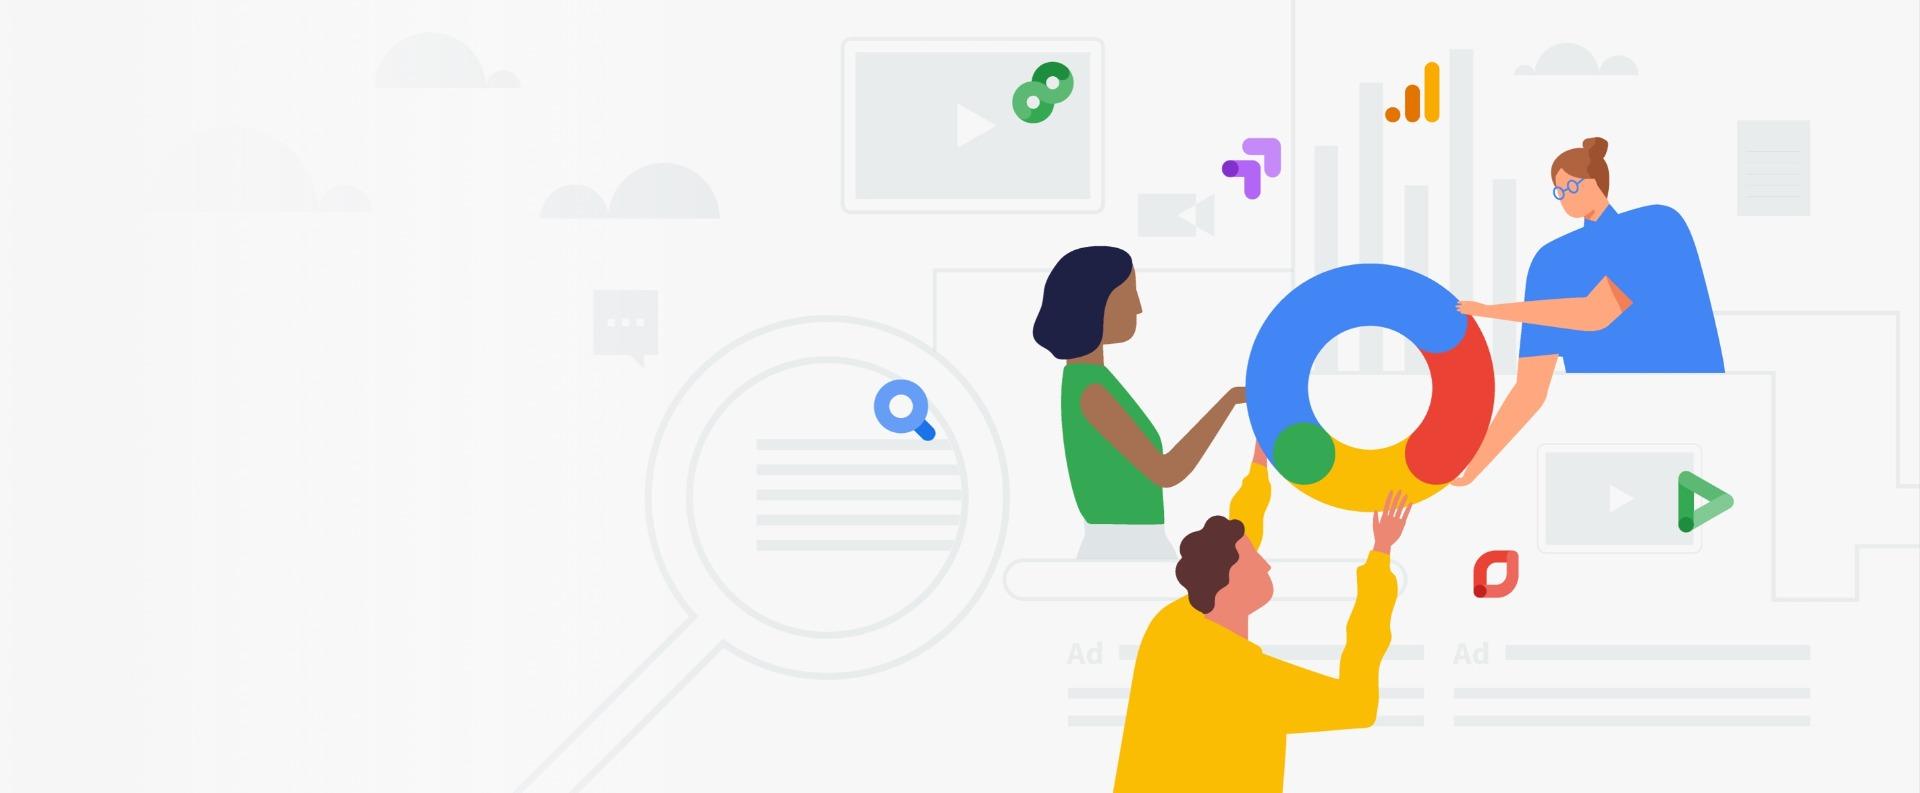 gmp-digital-learning